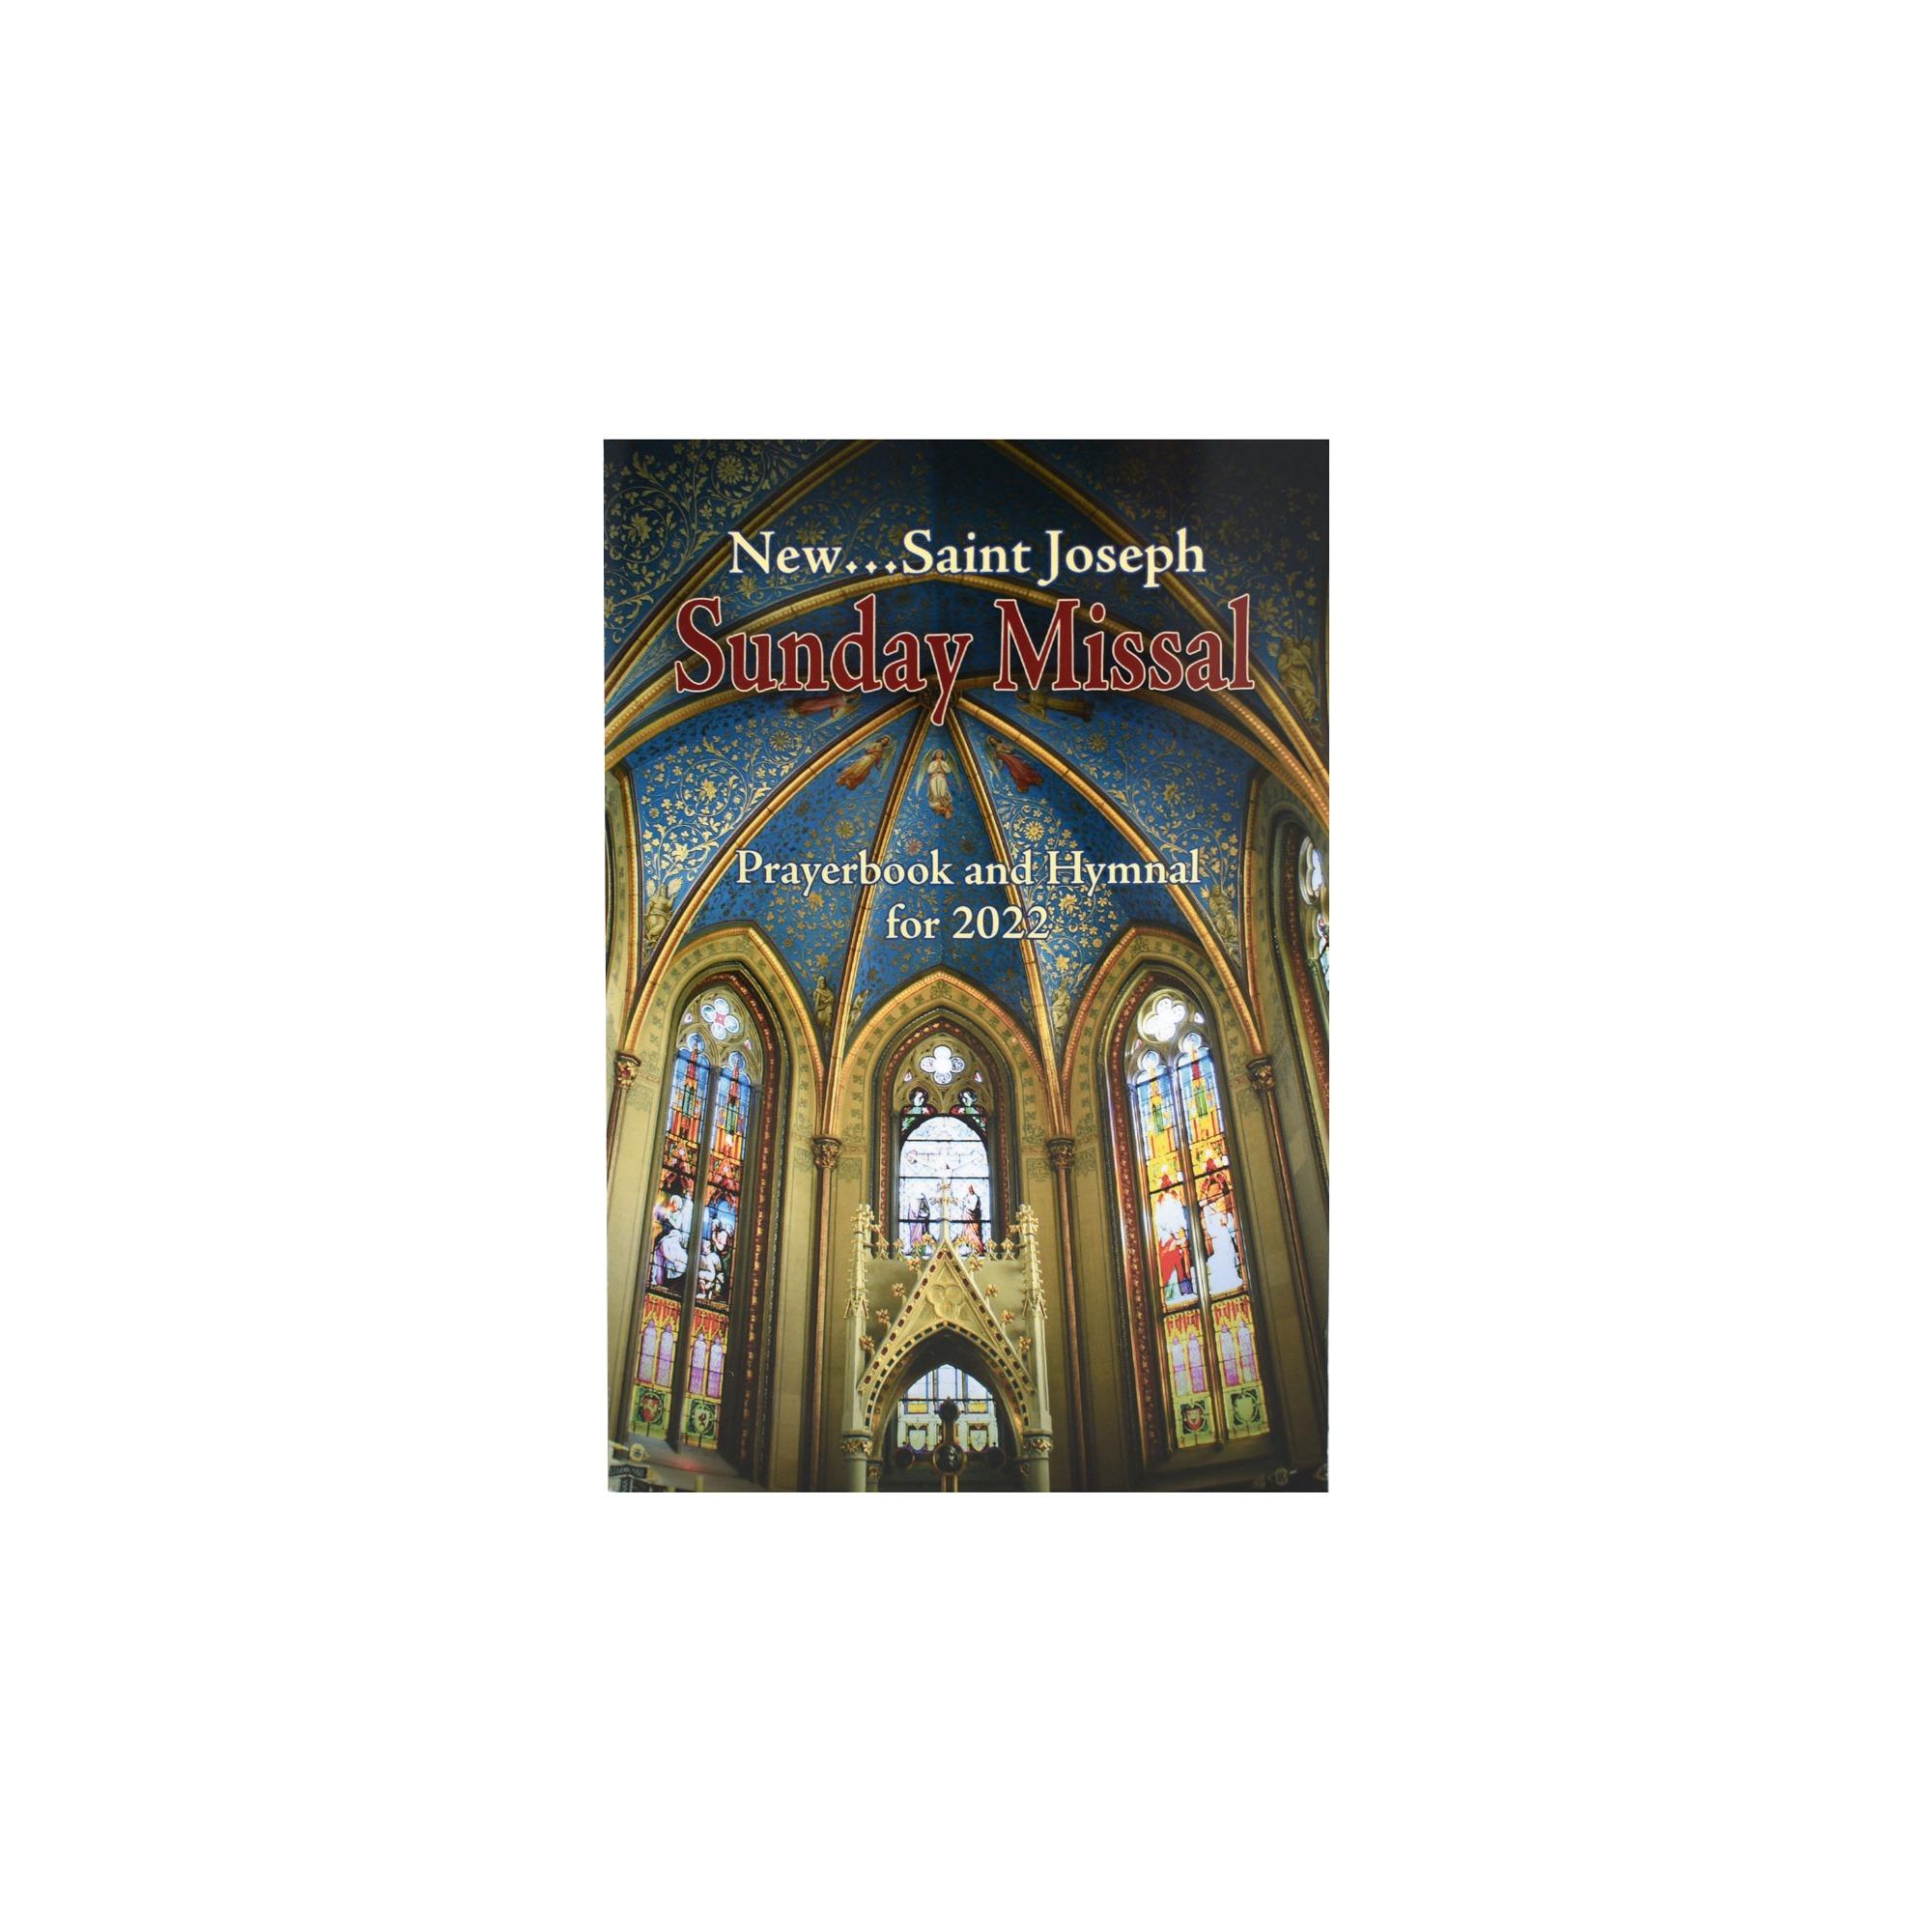 2019 New Saint Joseph Sunday Missal